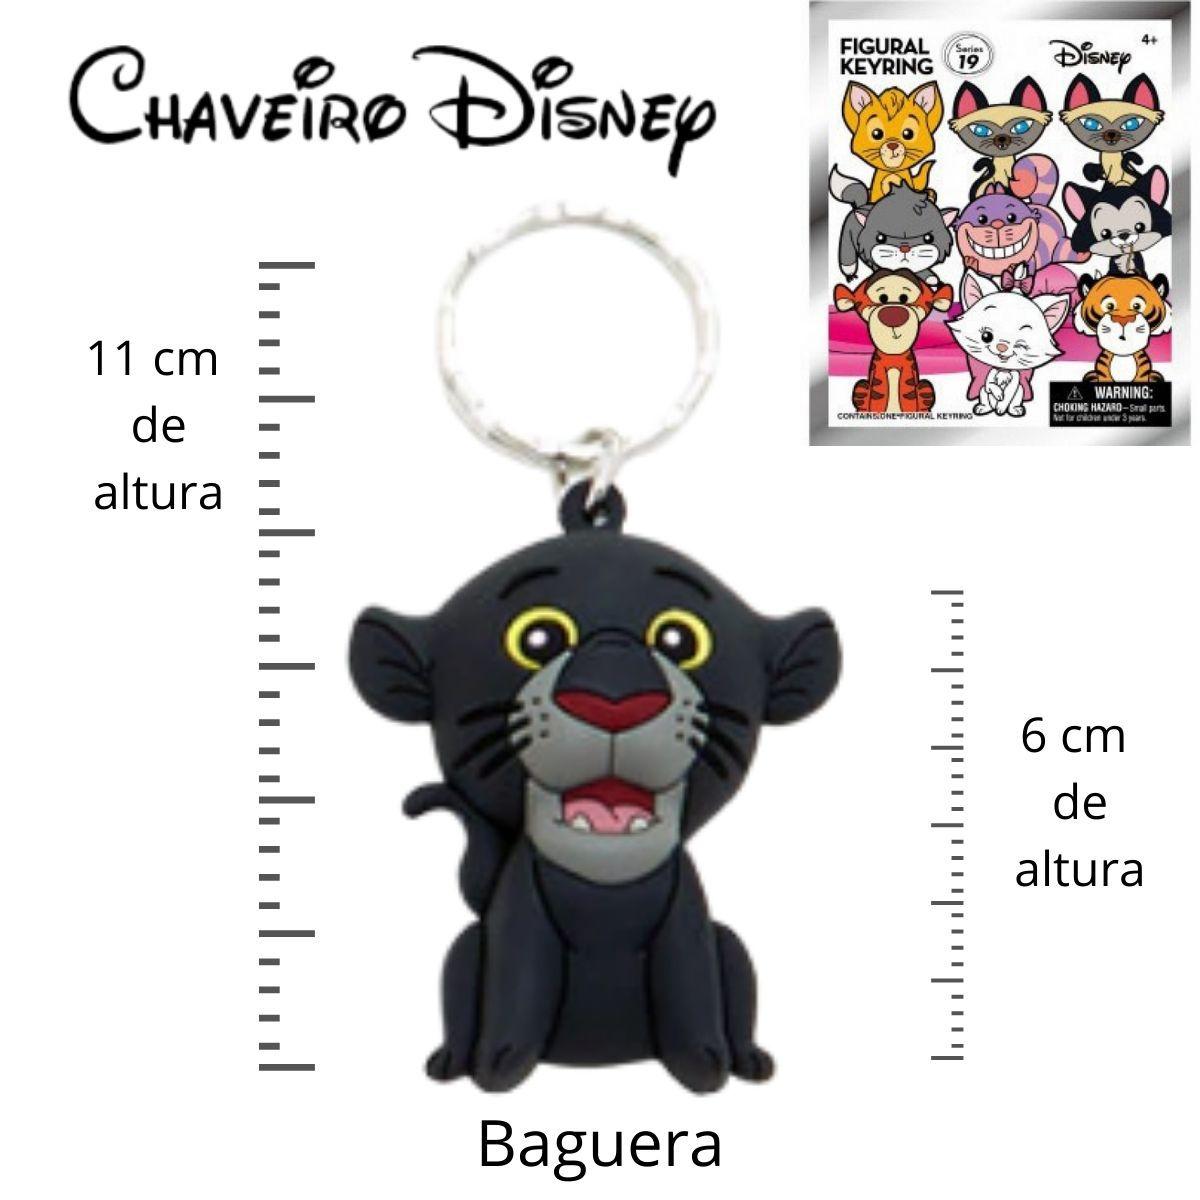 Chaveiro Disney Baguera - Filme Mogli  - Game Land Brinquedos